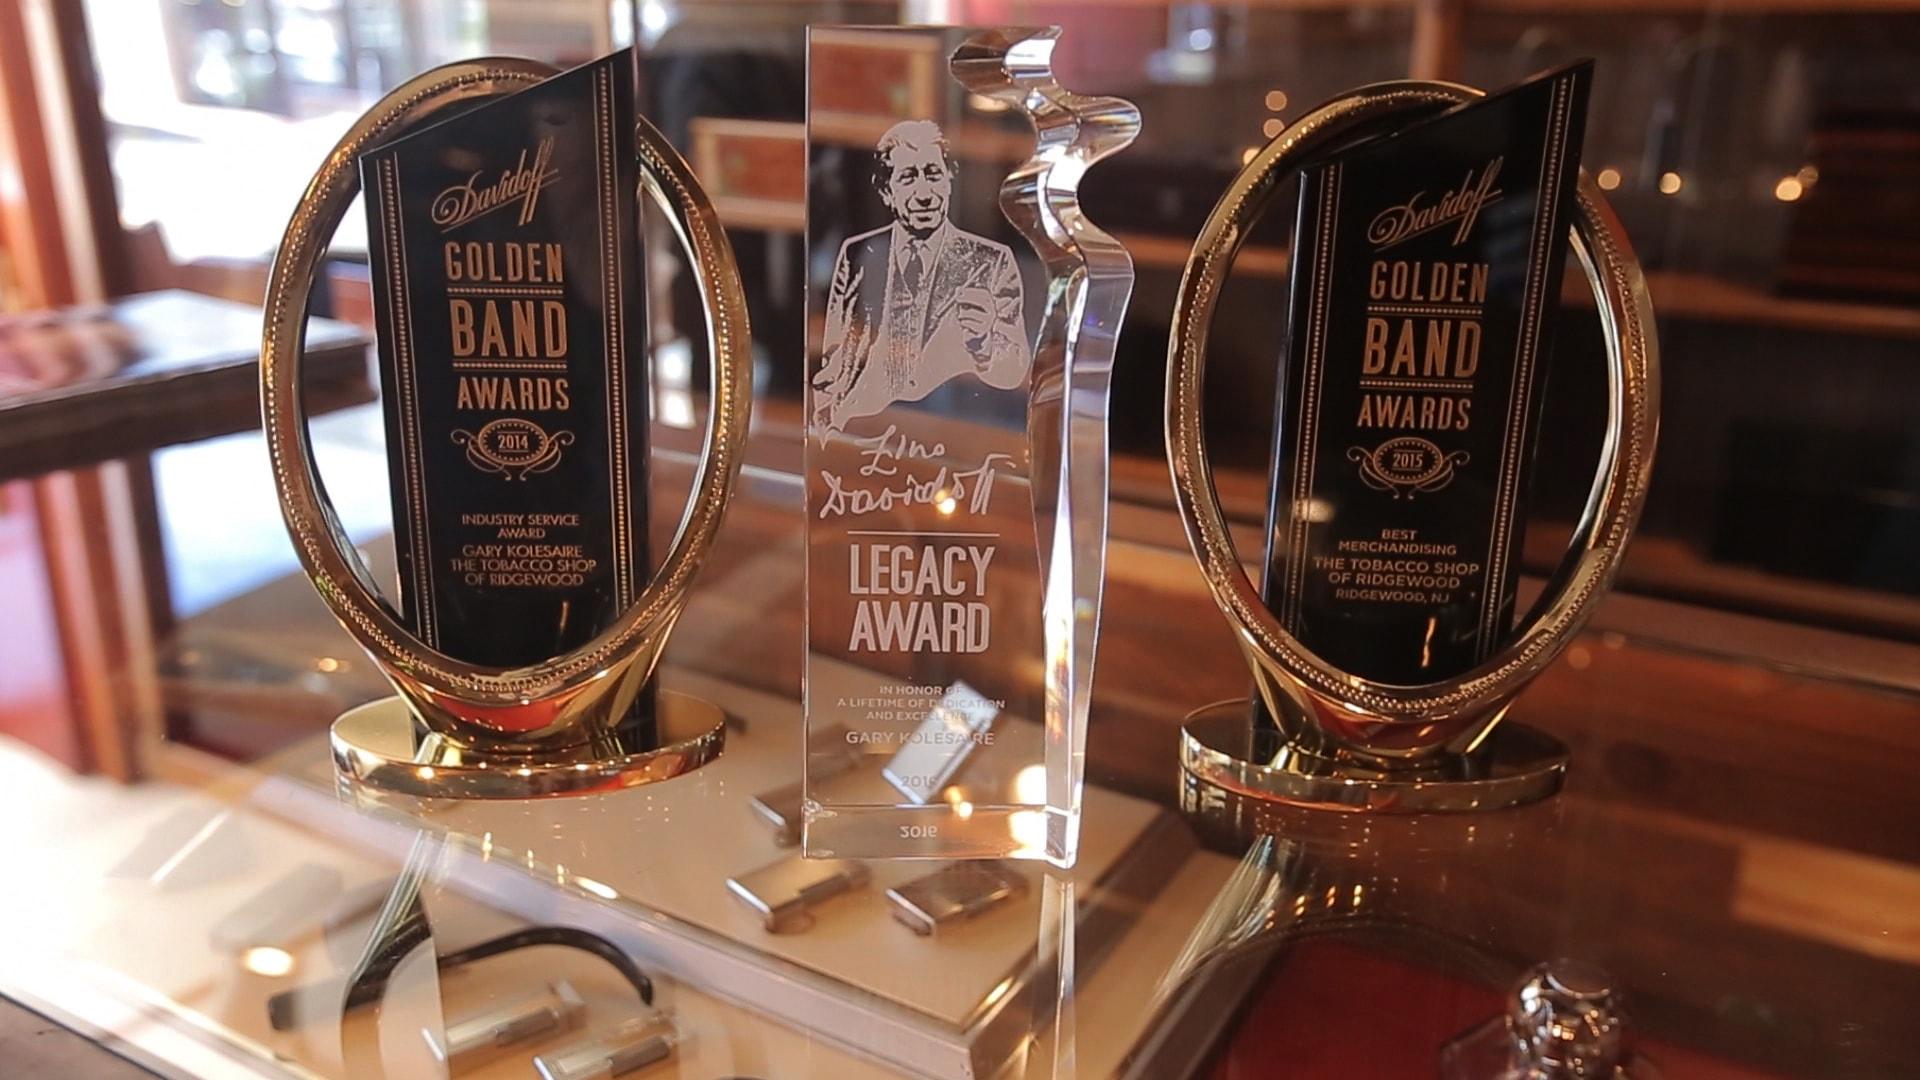 Award Winning Cigar and Tobacco Shop in Ridgewood NJ - Bergen County --min.jpg